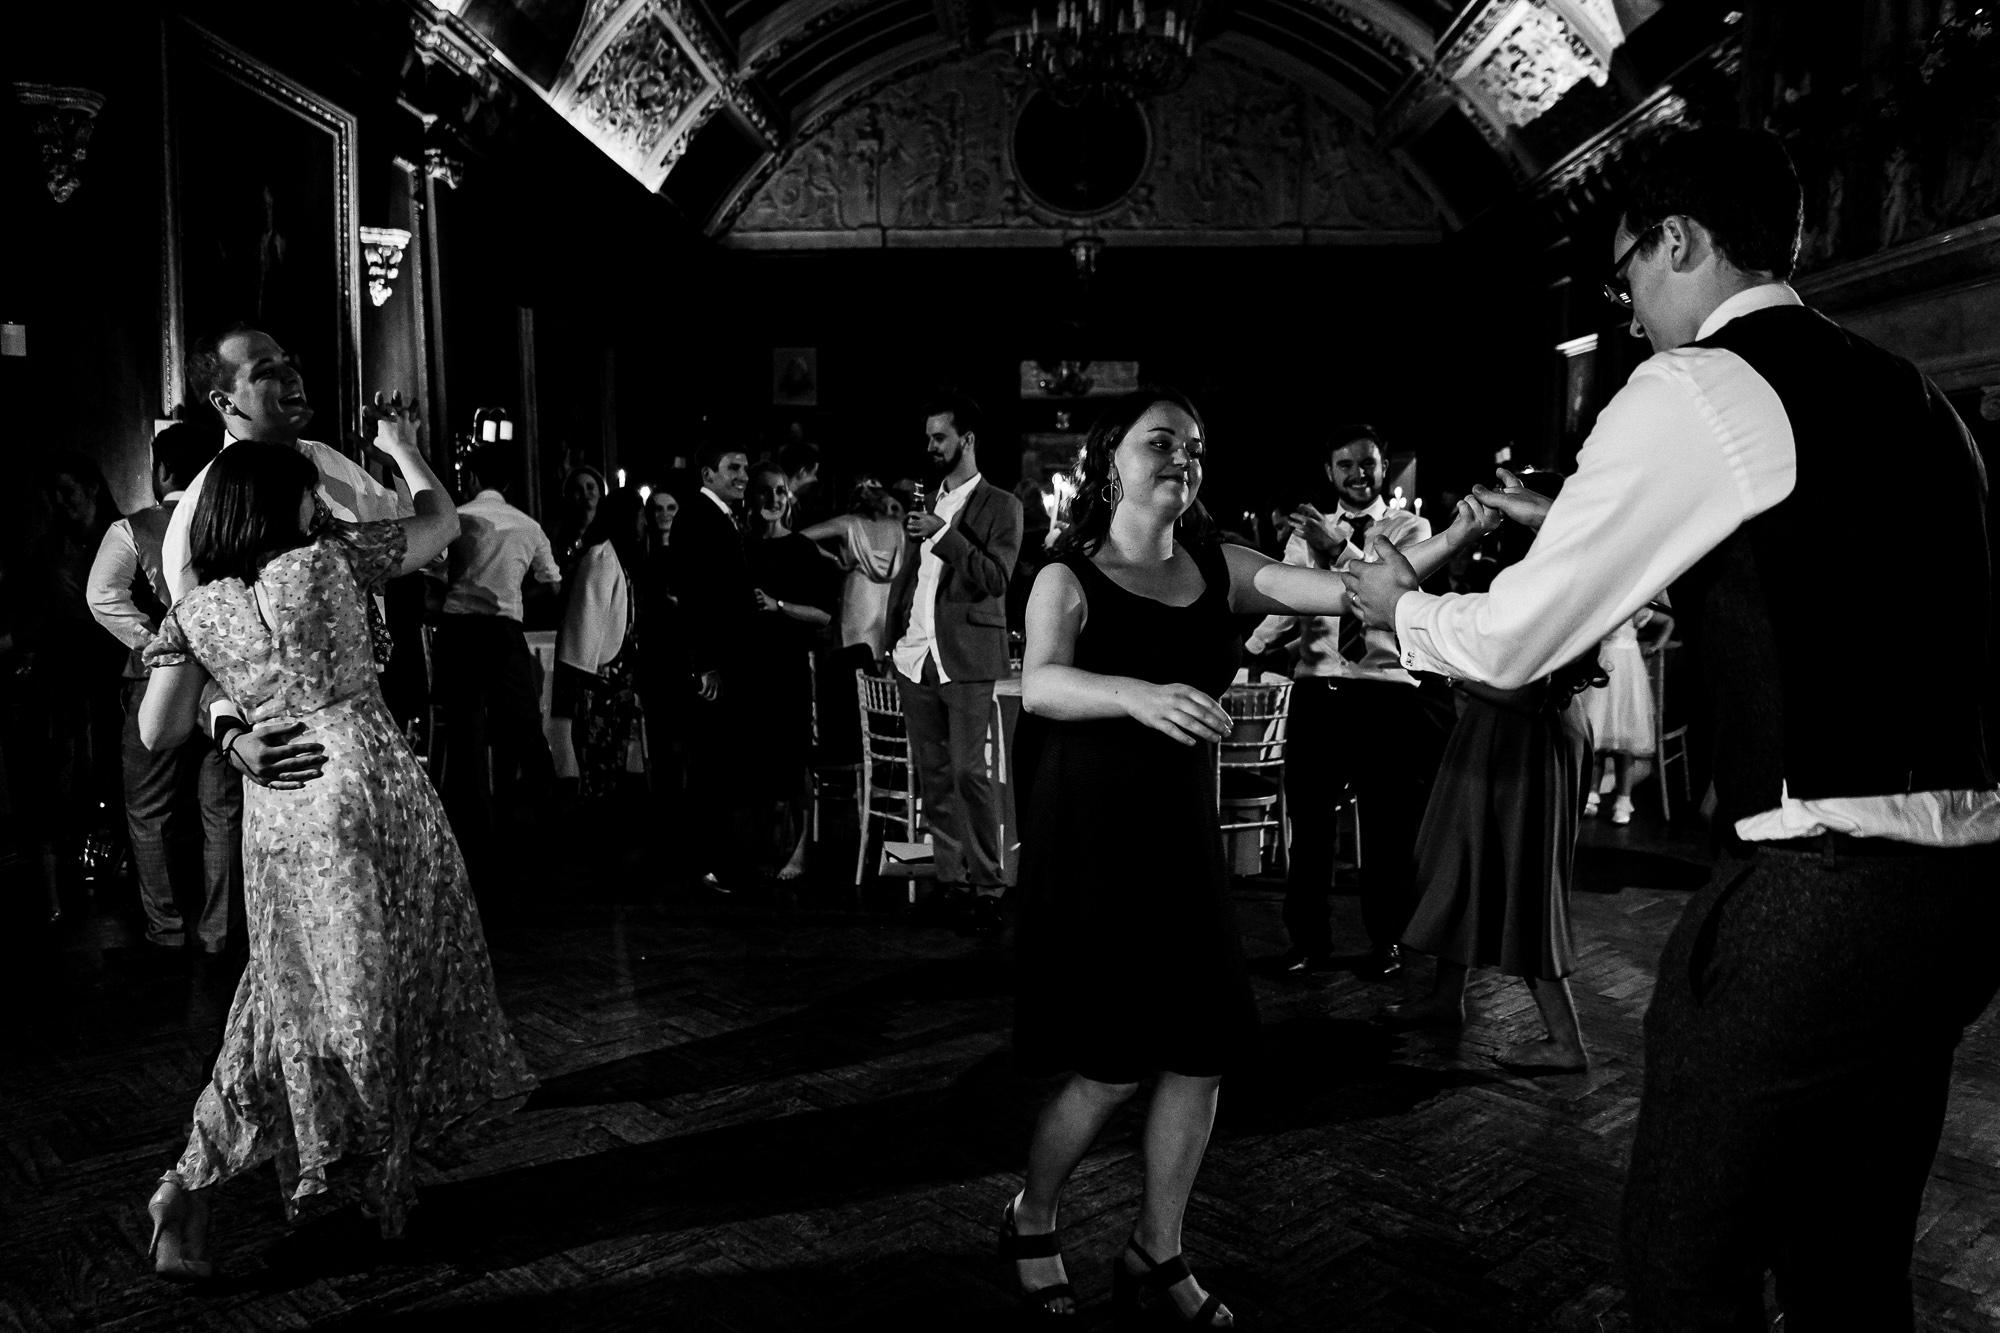 Thornton Manor Cheshire wedding photographer Wedding Photography Cheshire wedding photographer (62 of 64).jpg